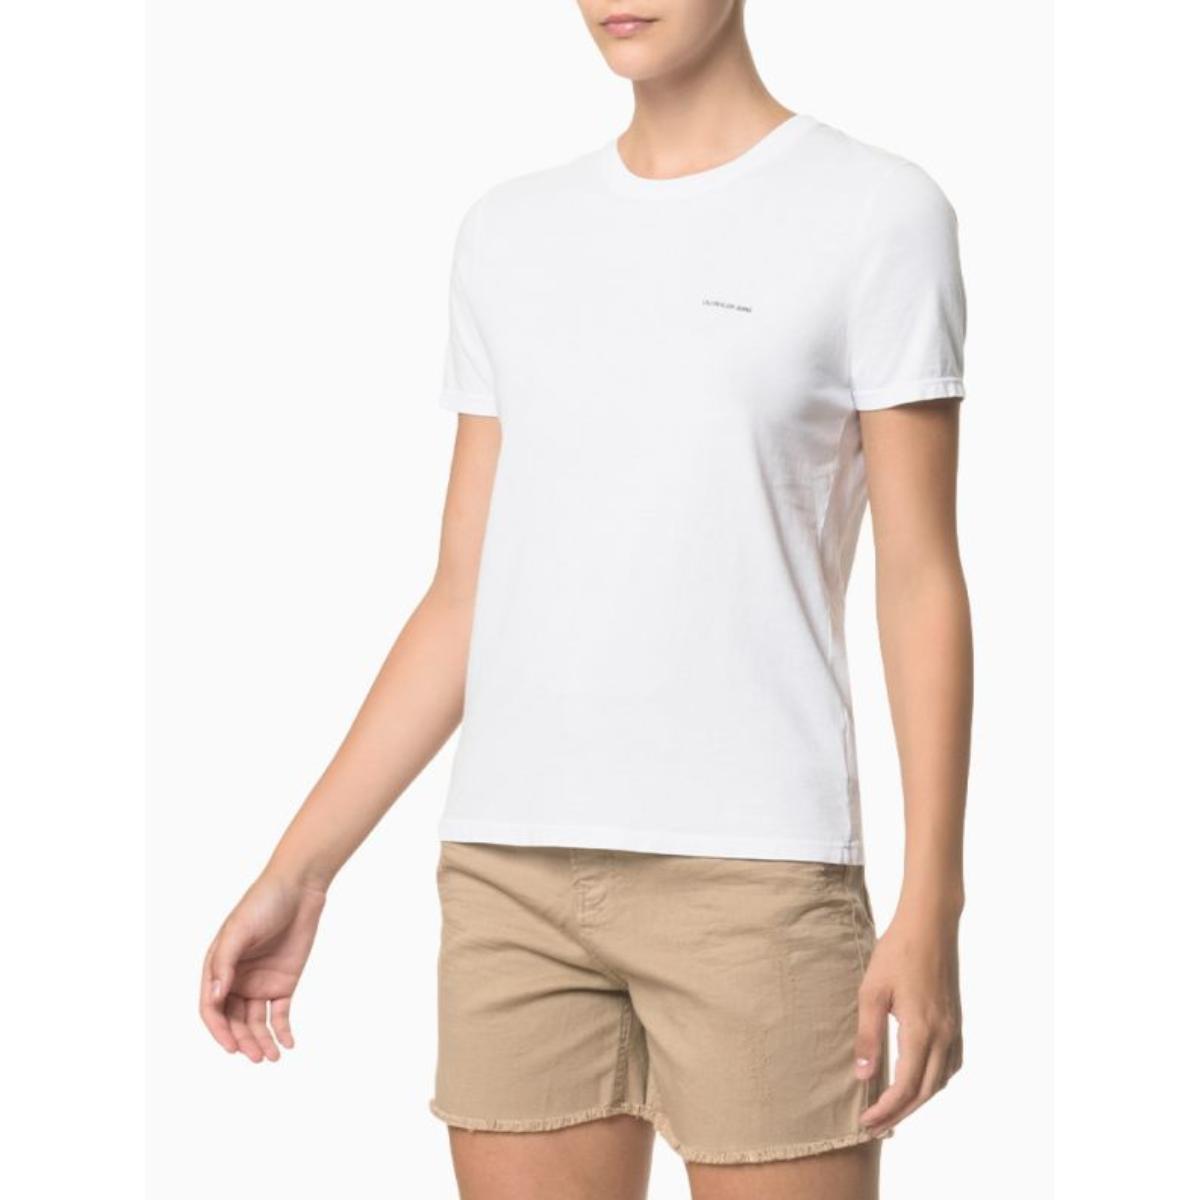 Camiseta Feminina Calvin Klein Ckjf100 Branco